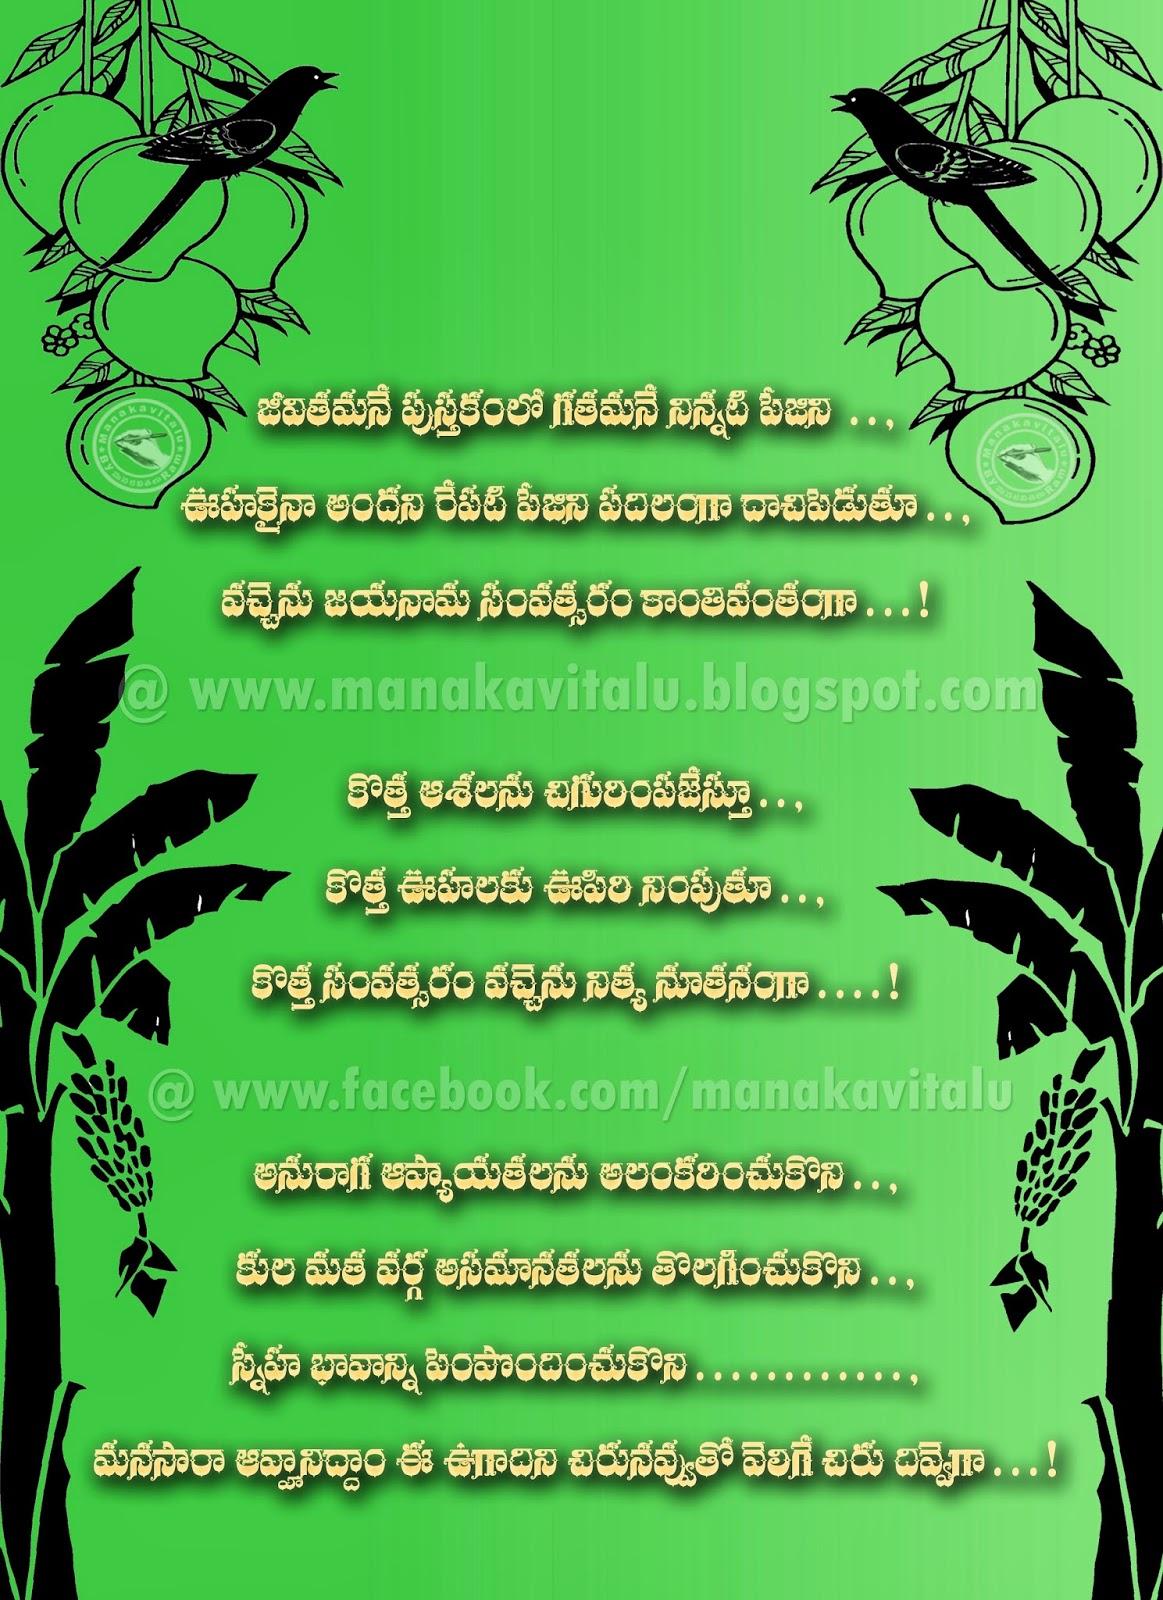 ugadi subhakankshalu wishes telugu kavitha, message, kavitvam, katha, poetry in english to by manakavitalu submitted by savitha on images photos jpg gif png downloads